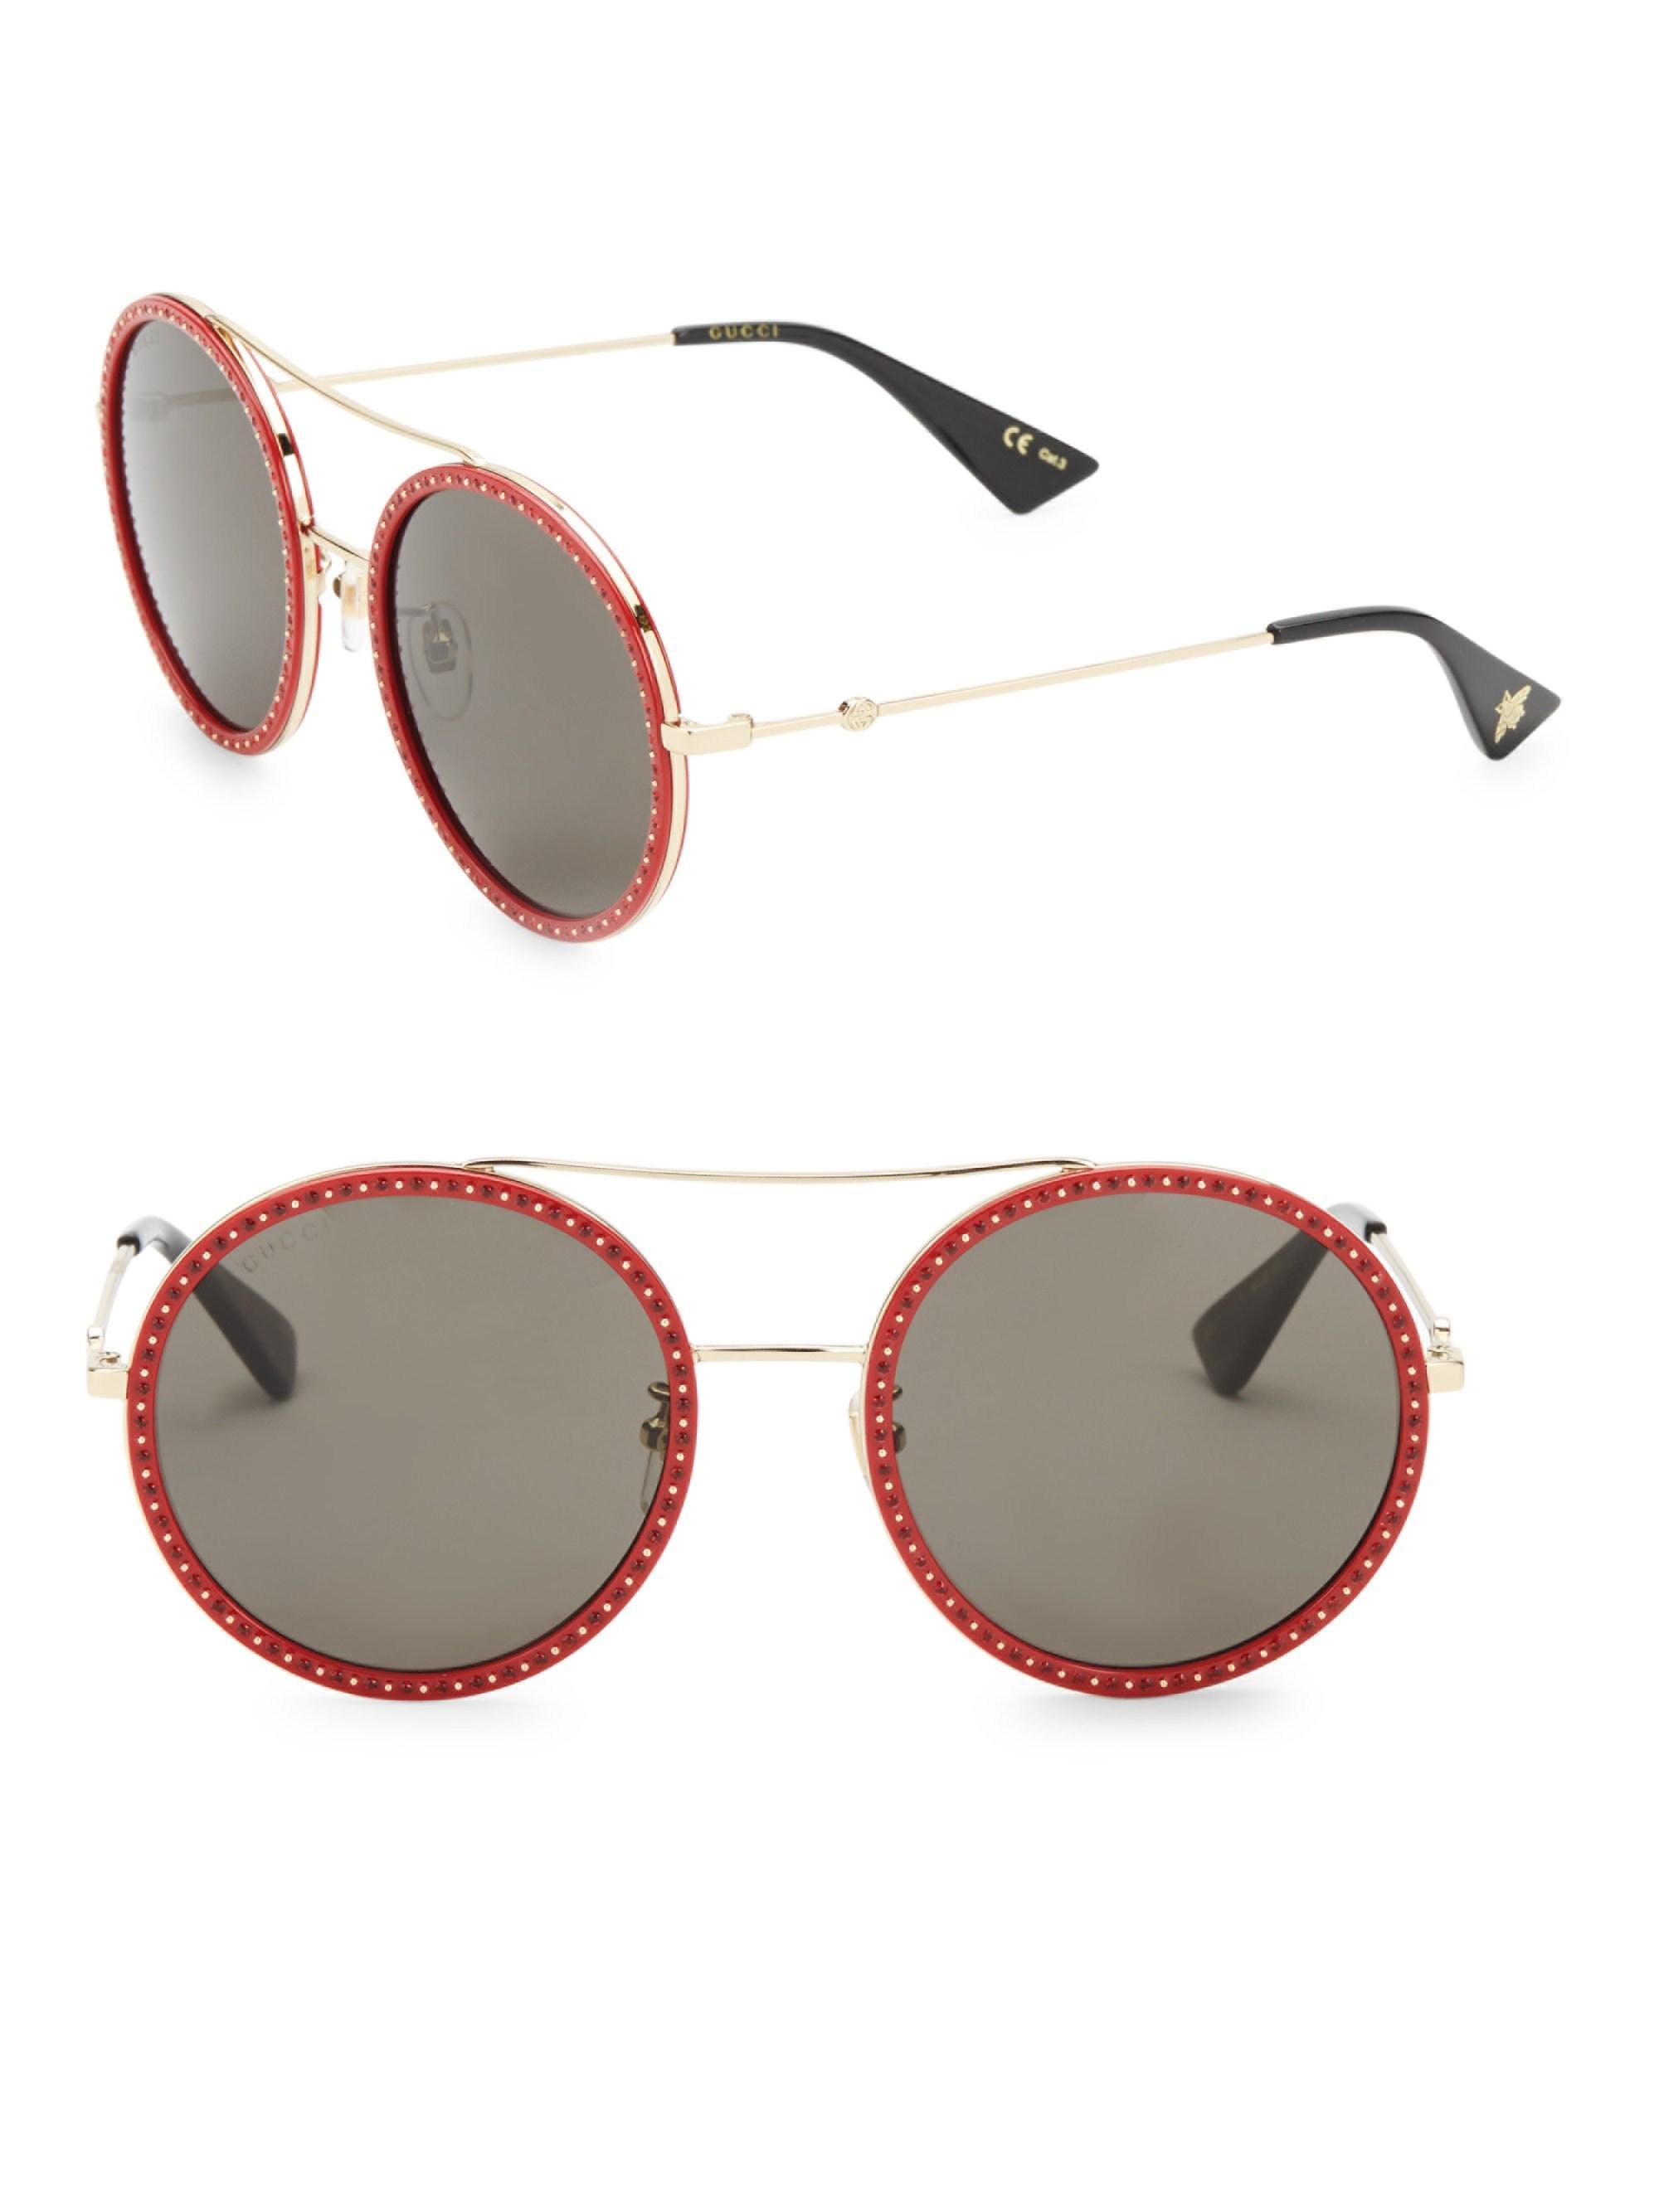 5646fd25412 Gucci - Red Round Metal Sunglasses - Lyst. View fullscreen